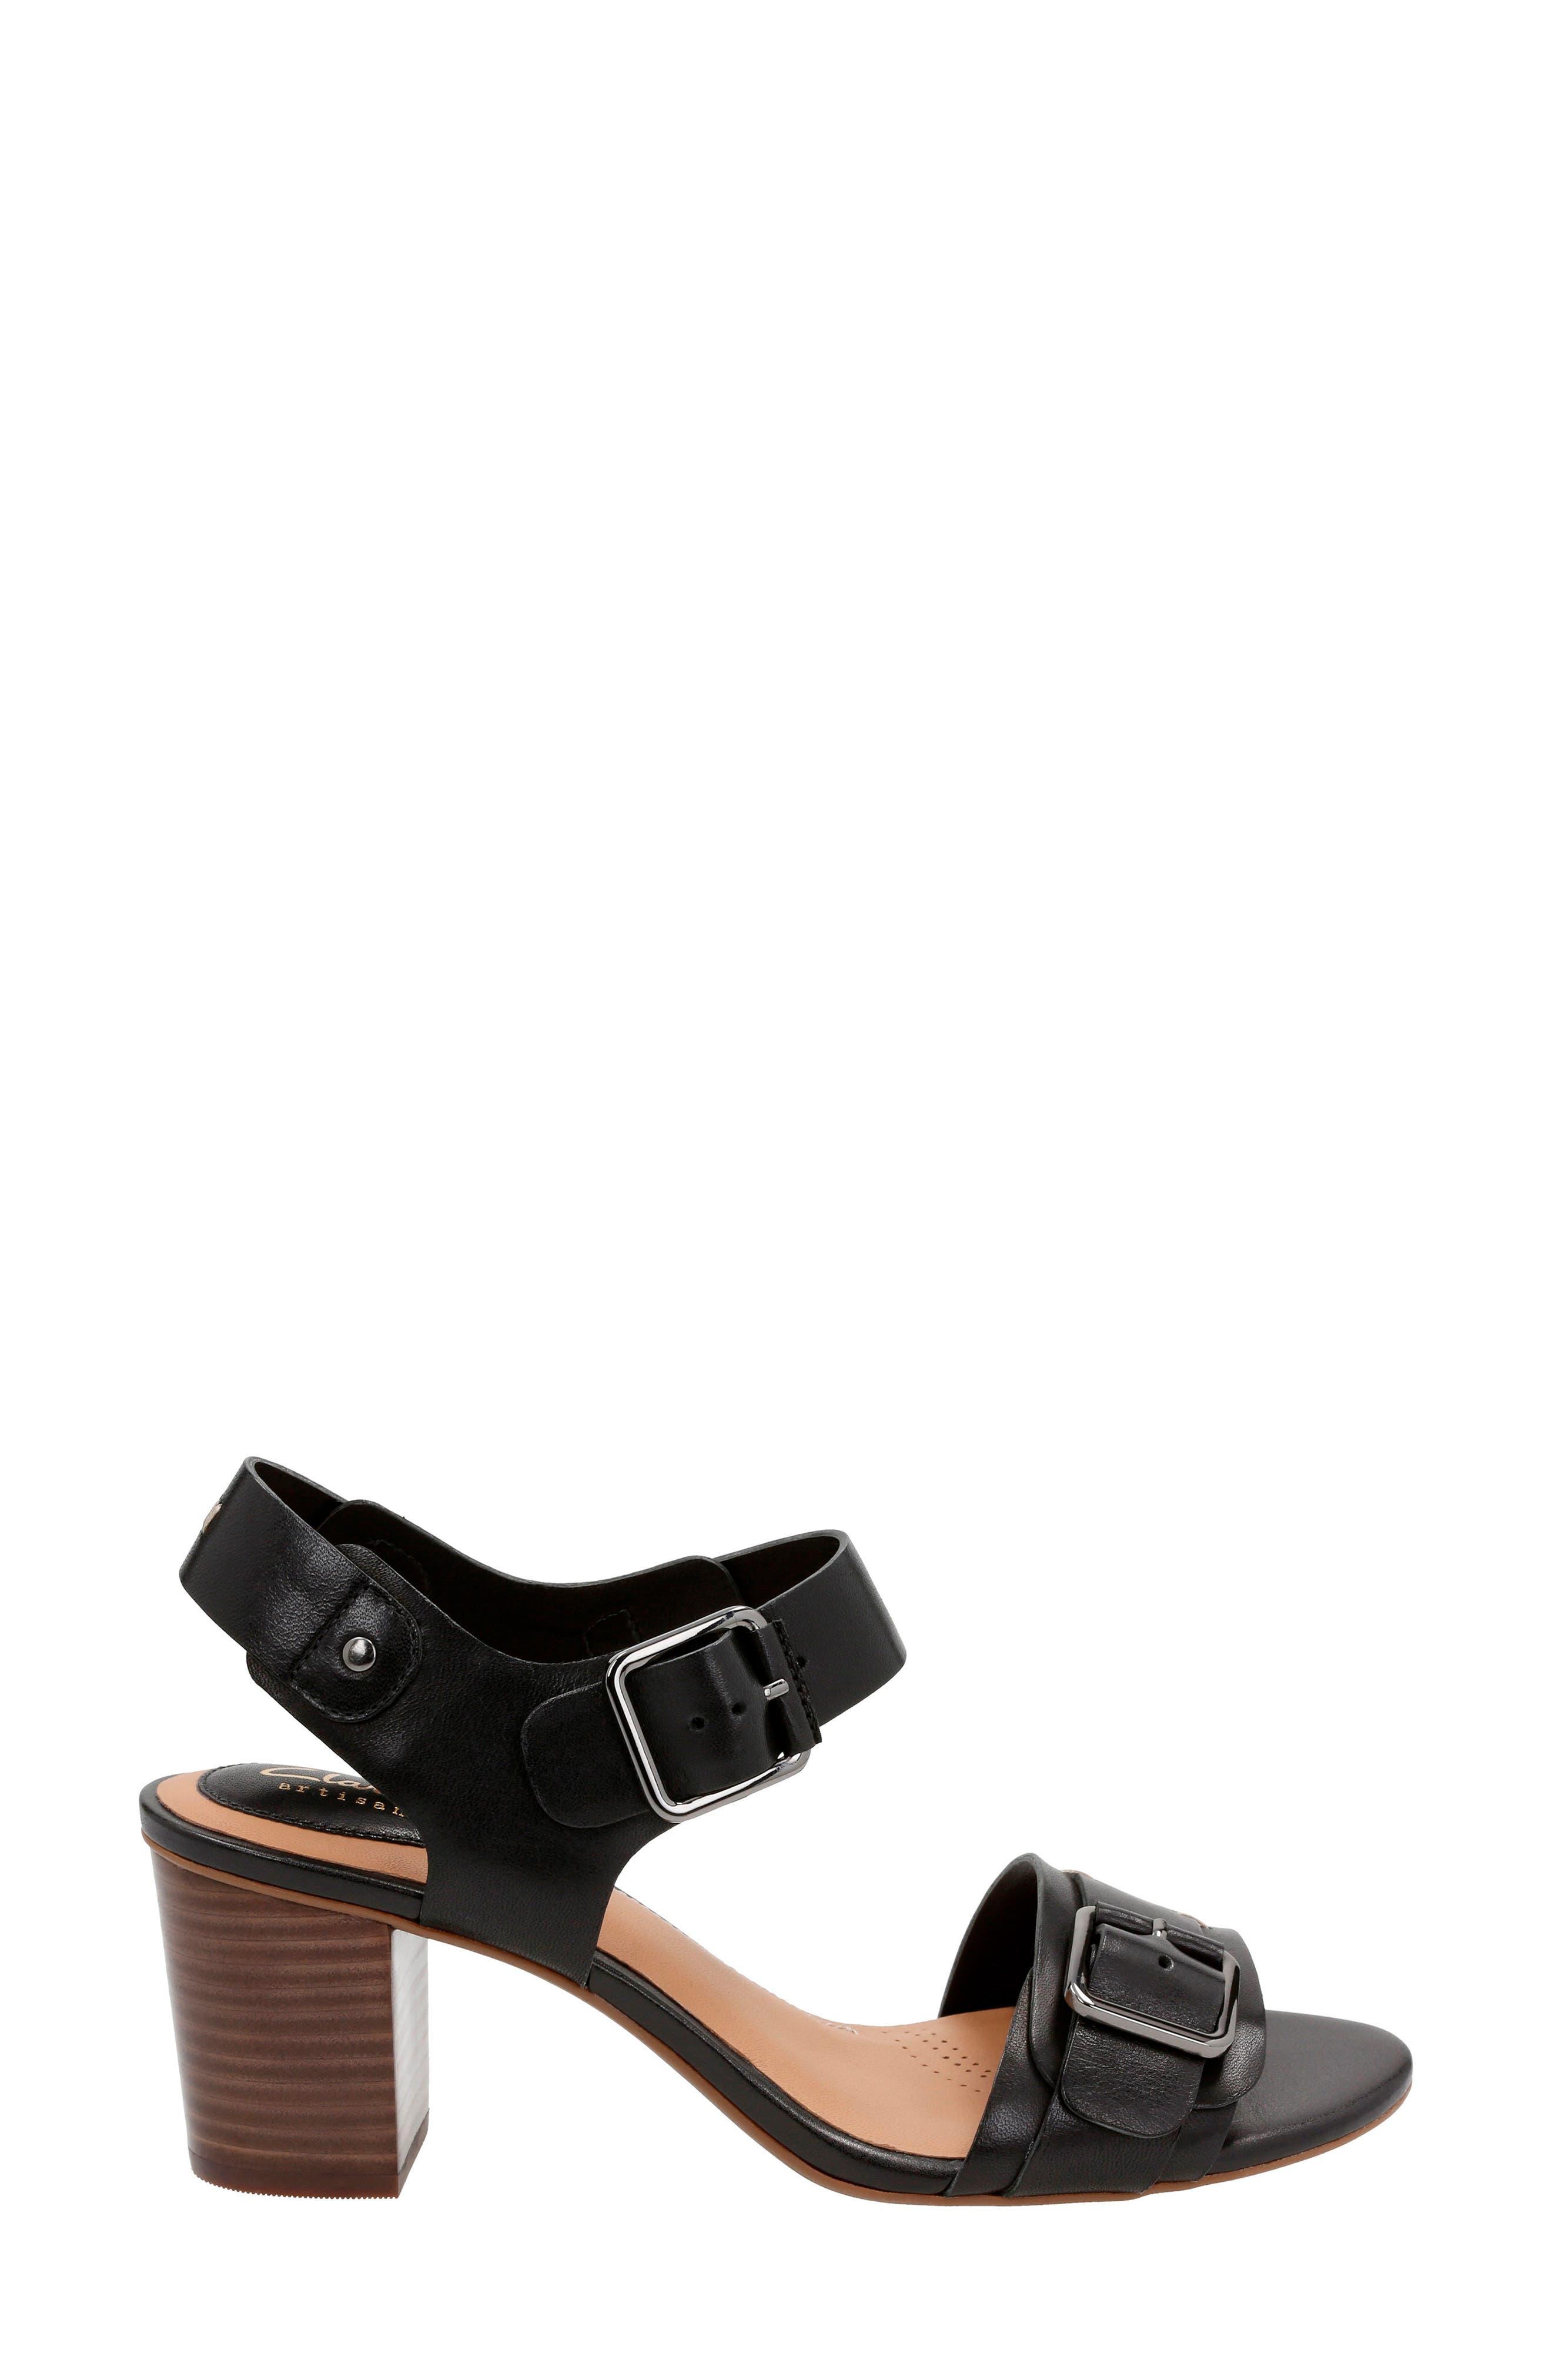 Ralene Dazzle Sandal,                             Alternate thumbnail 2, color,                             Black Leather